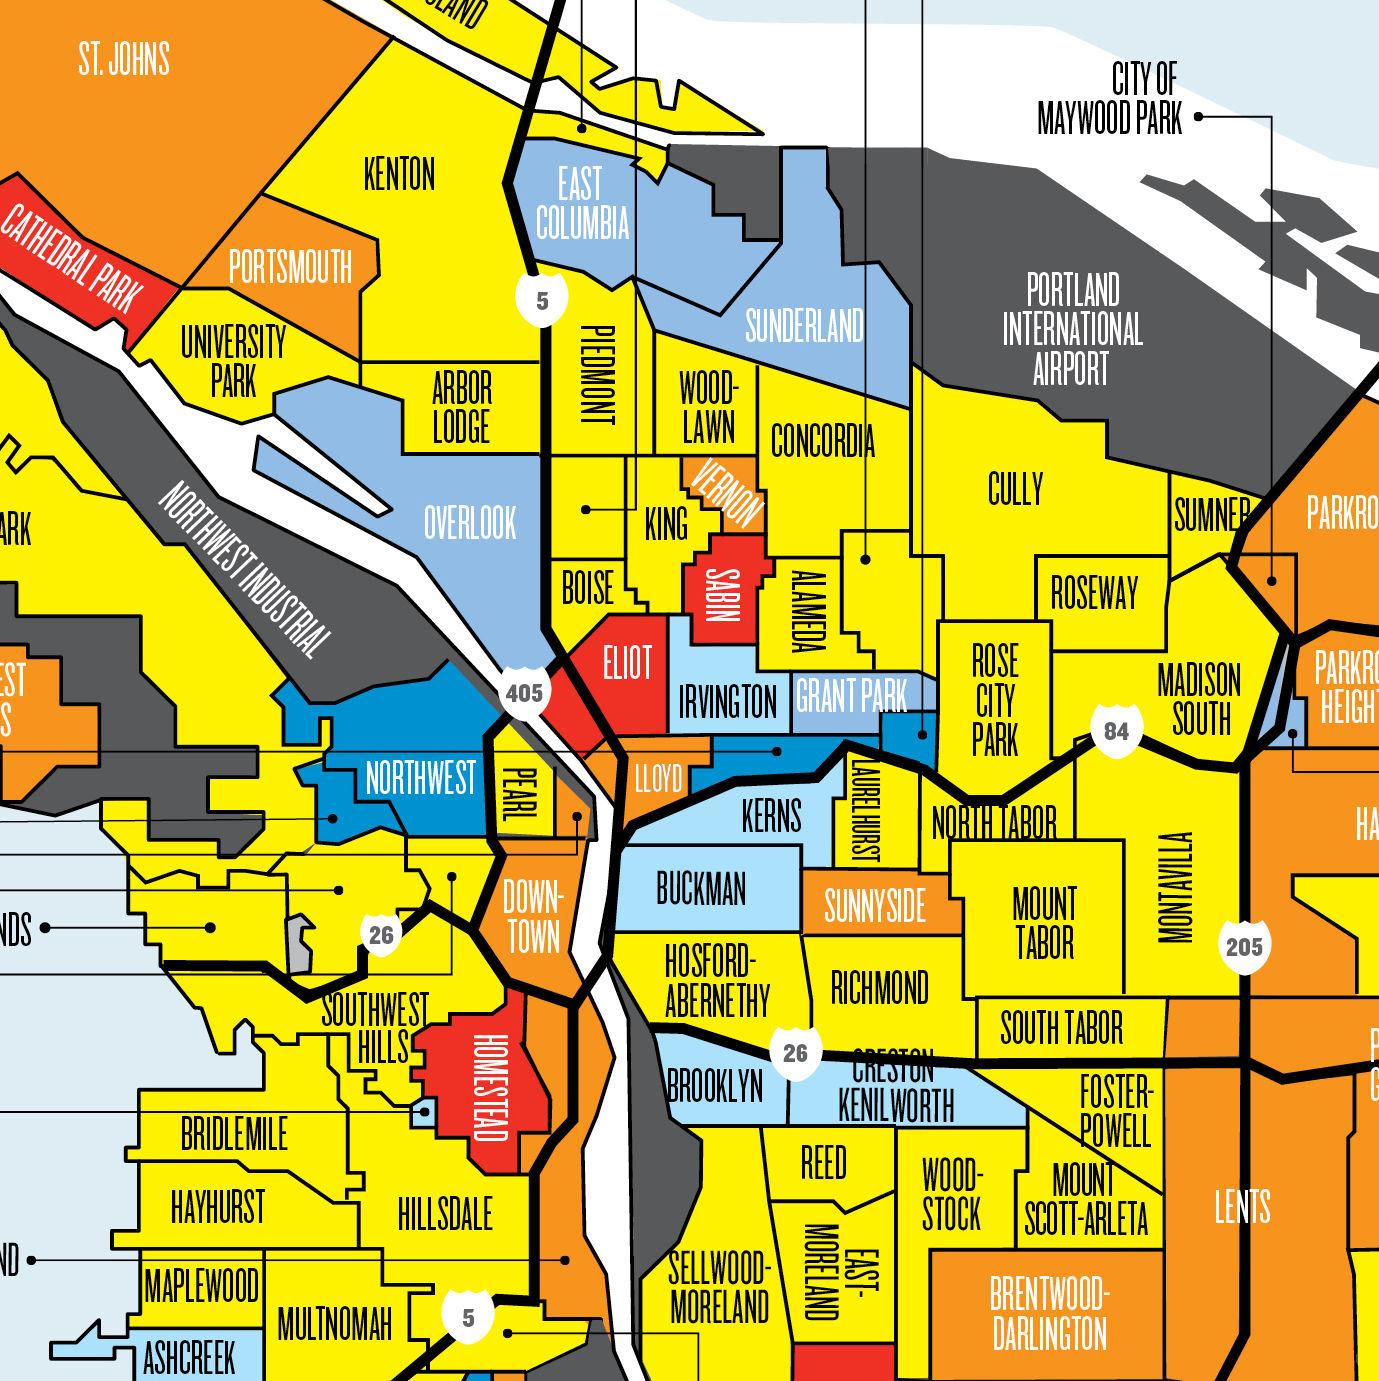 0418 real estate map revised ud2480